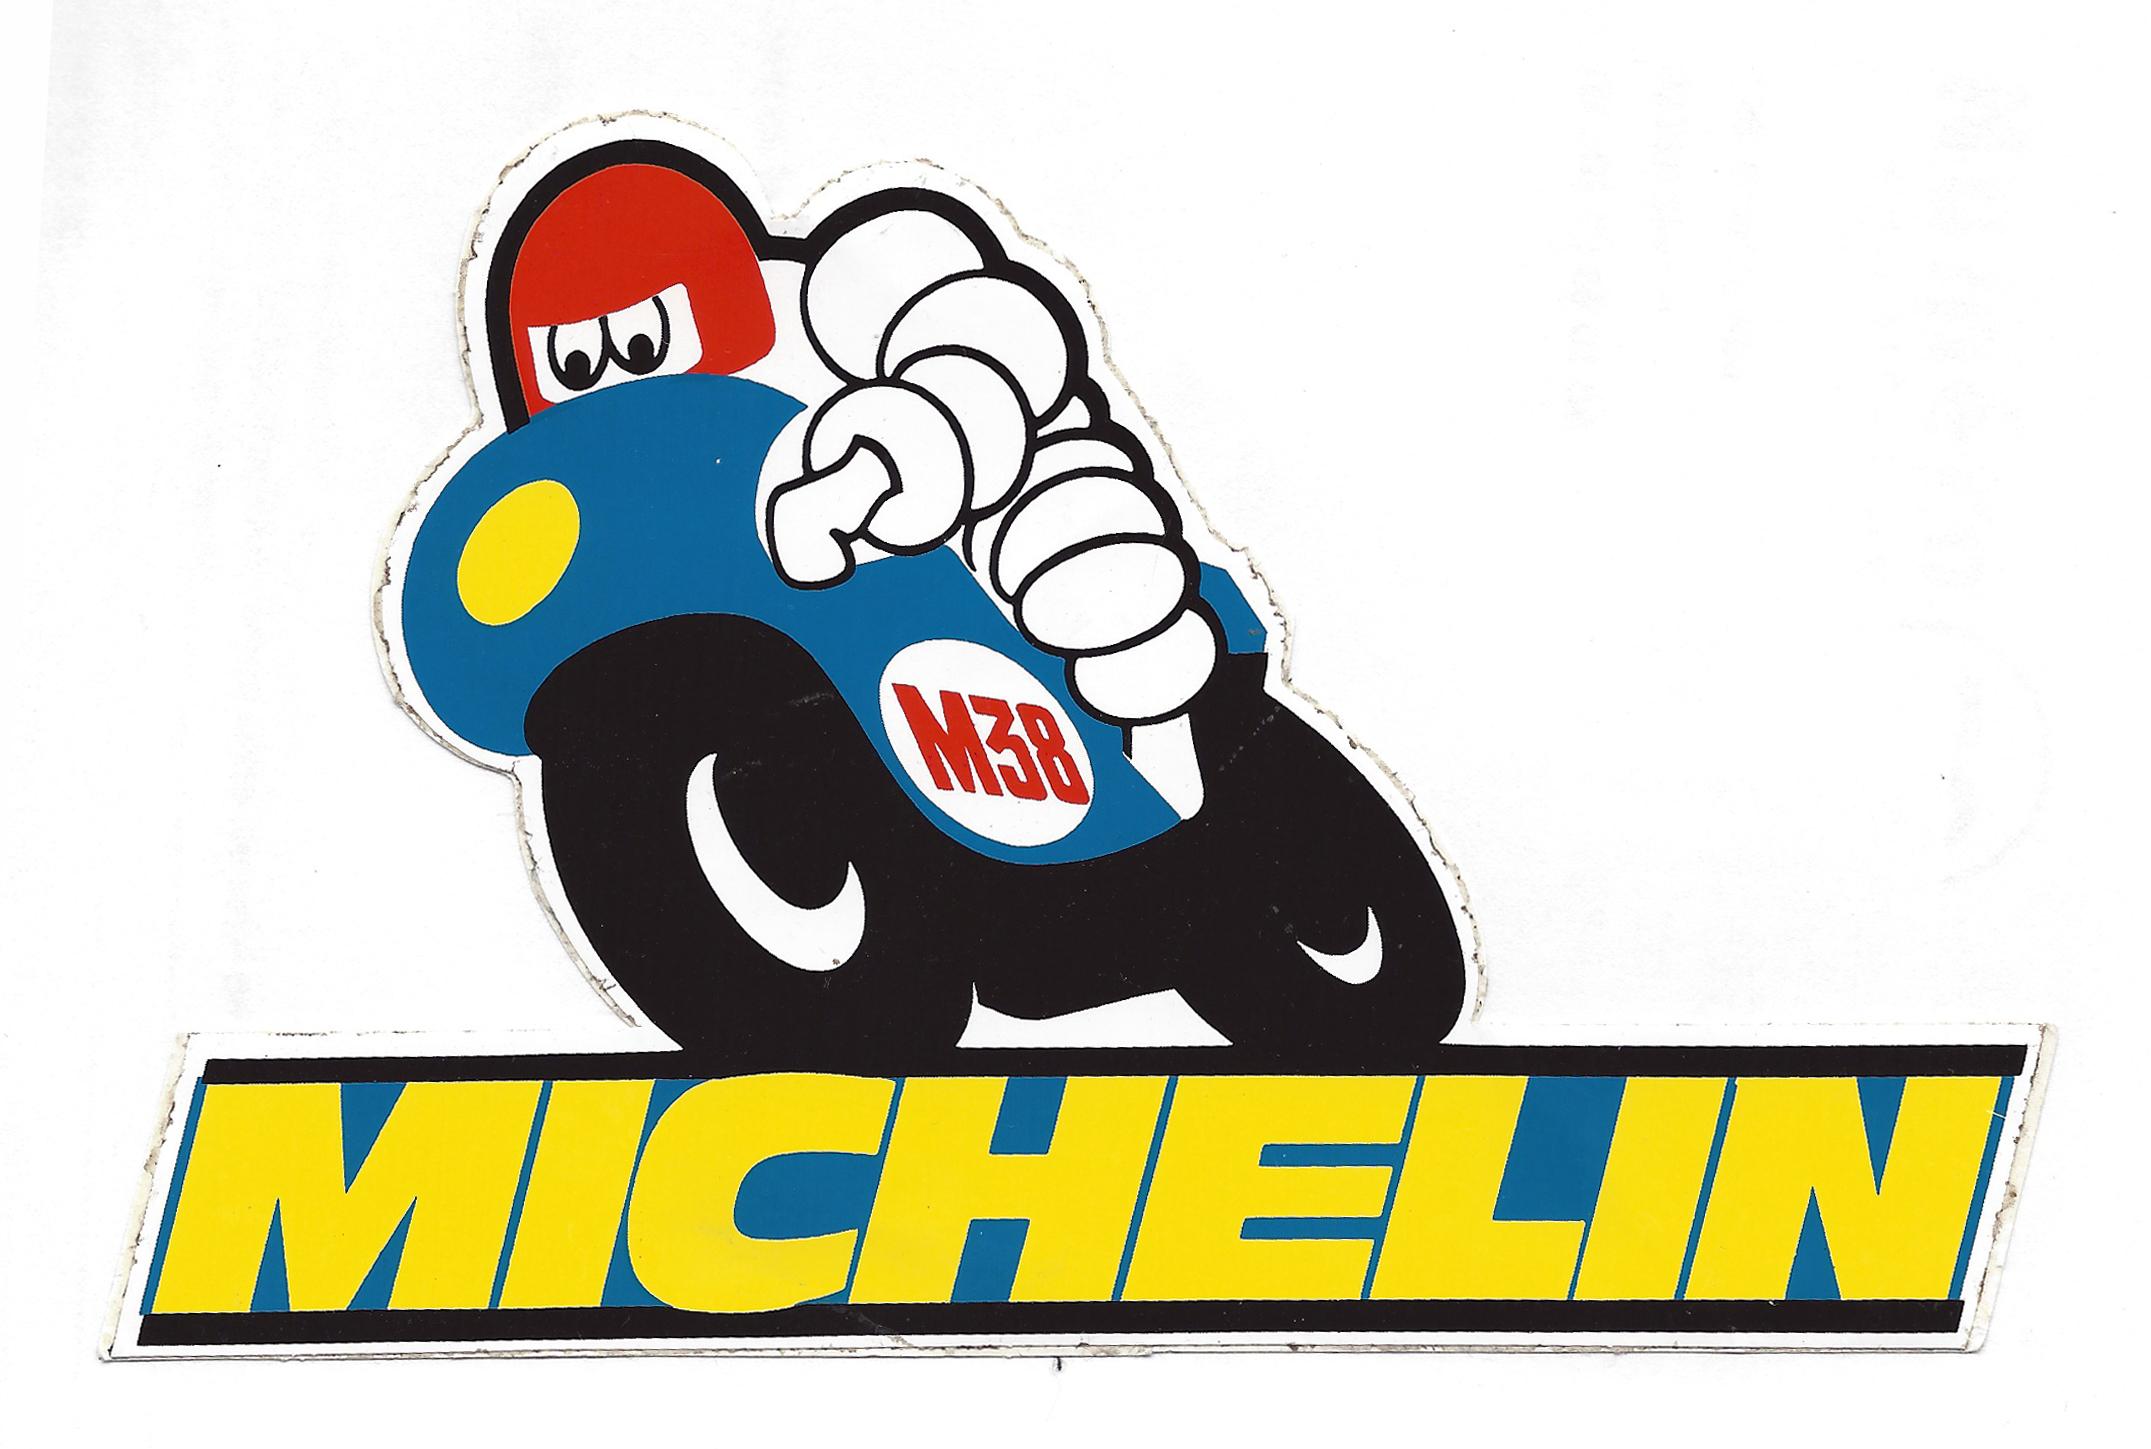 Michelin Tires Logo Vector PNG-PlusPNG.com-2151 - Michelin Tires Logo Vector PNG